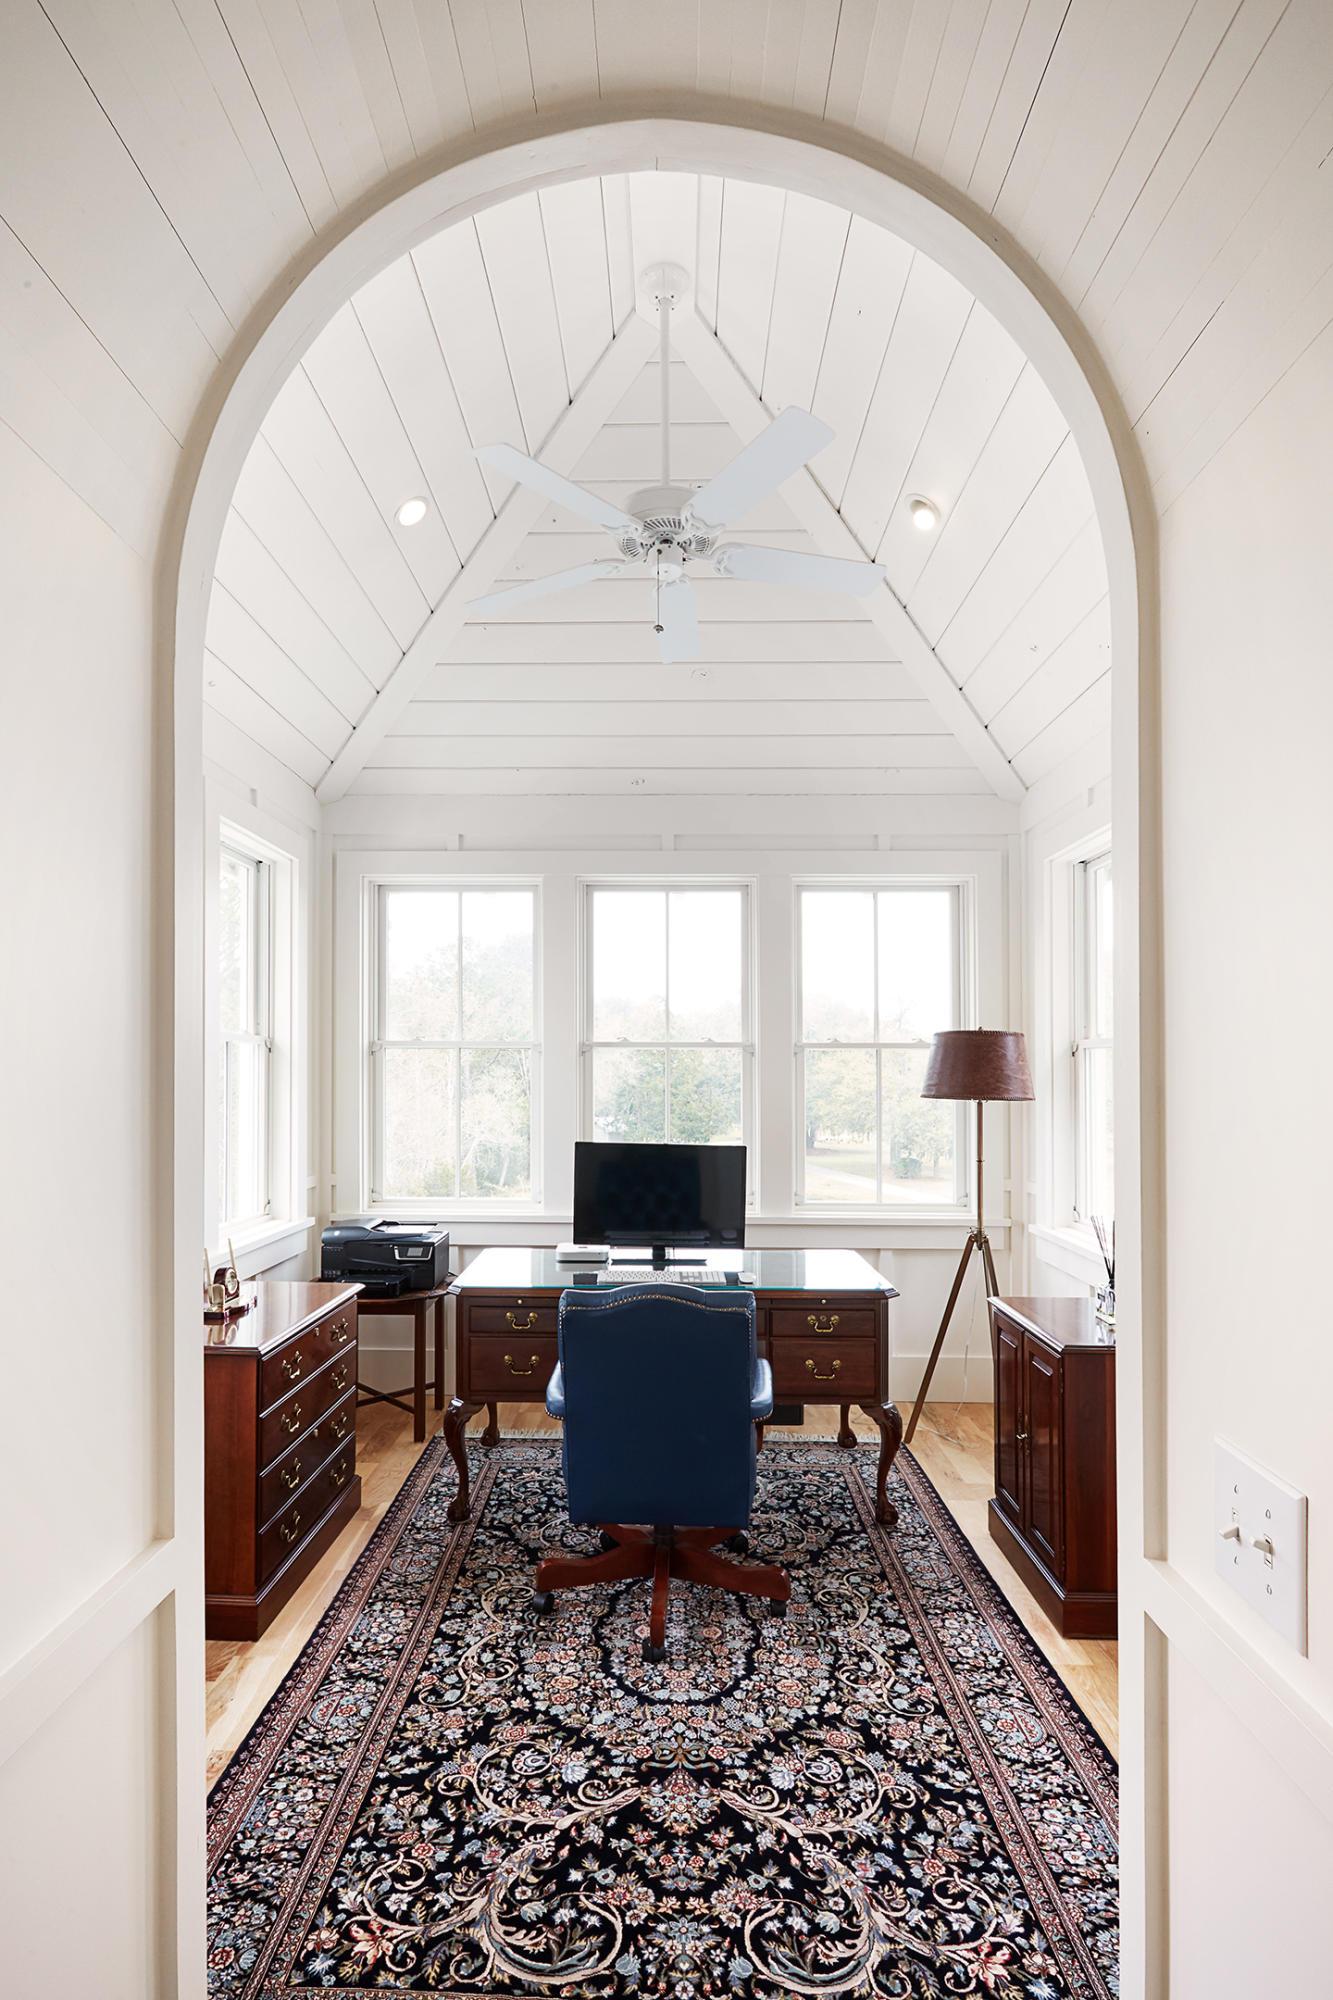 White Stalls Pt Jackson Homes For Sale - 625 Hall, Awendaw, SC - 24